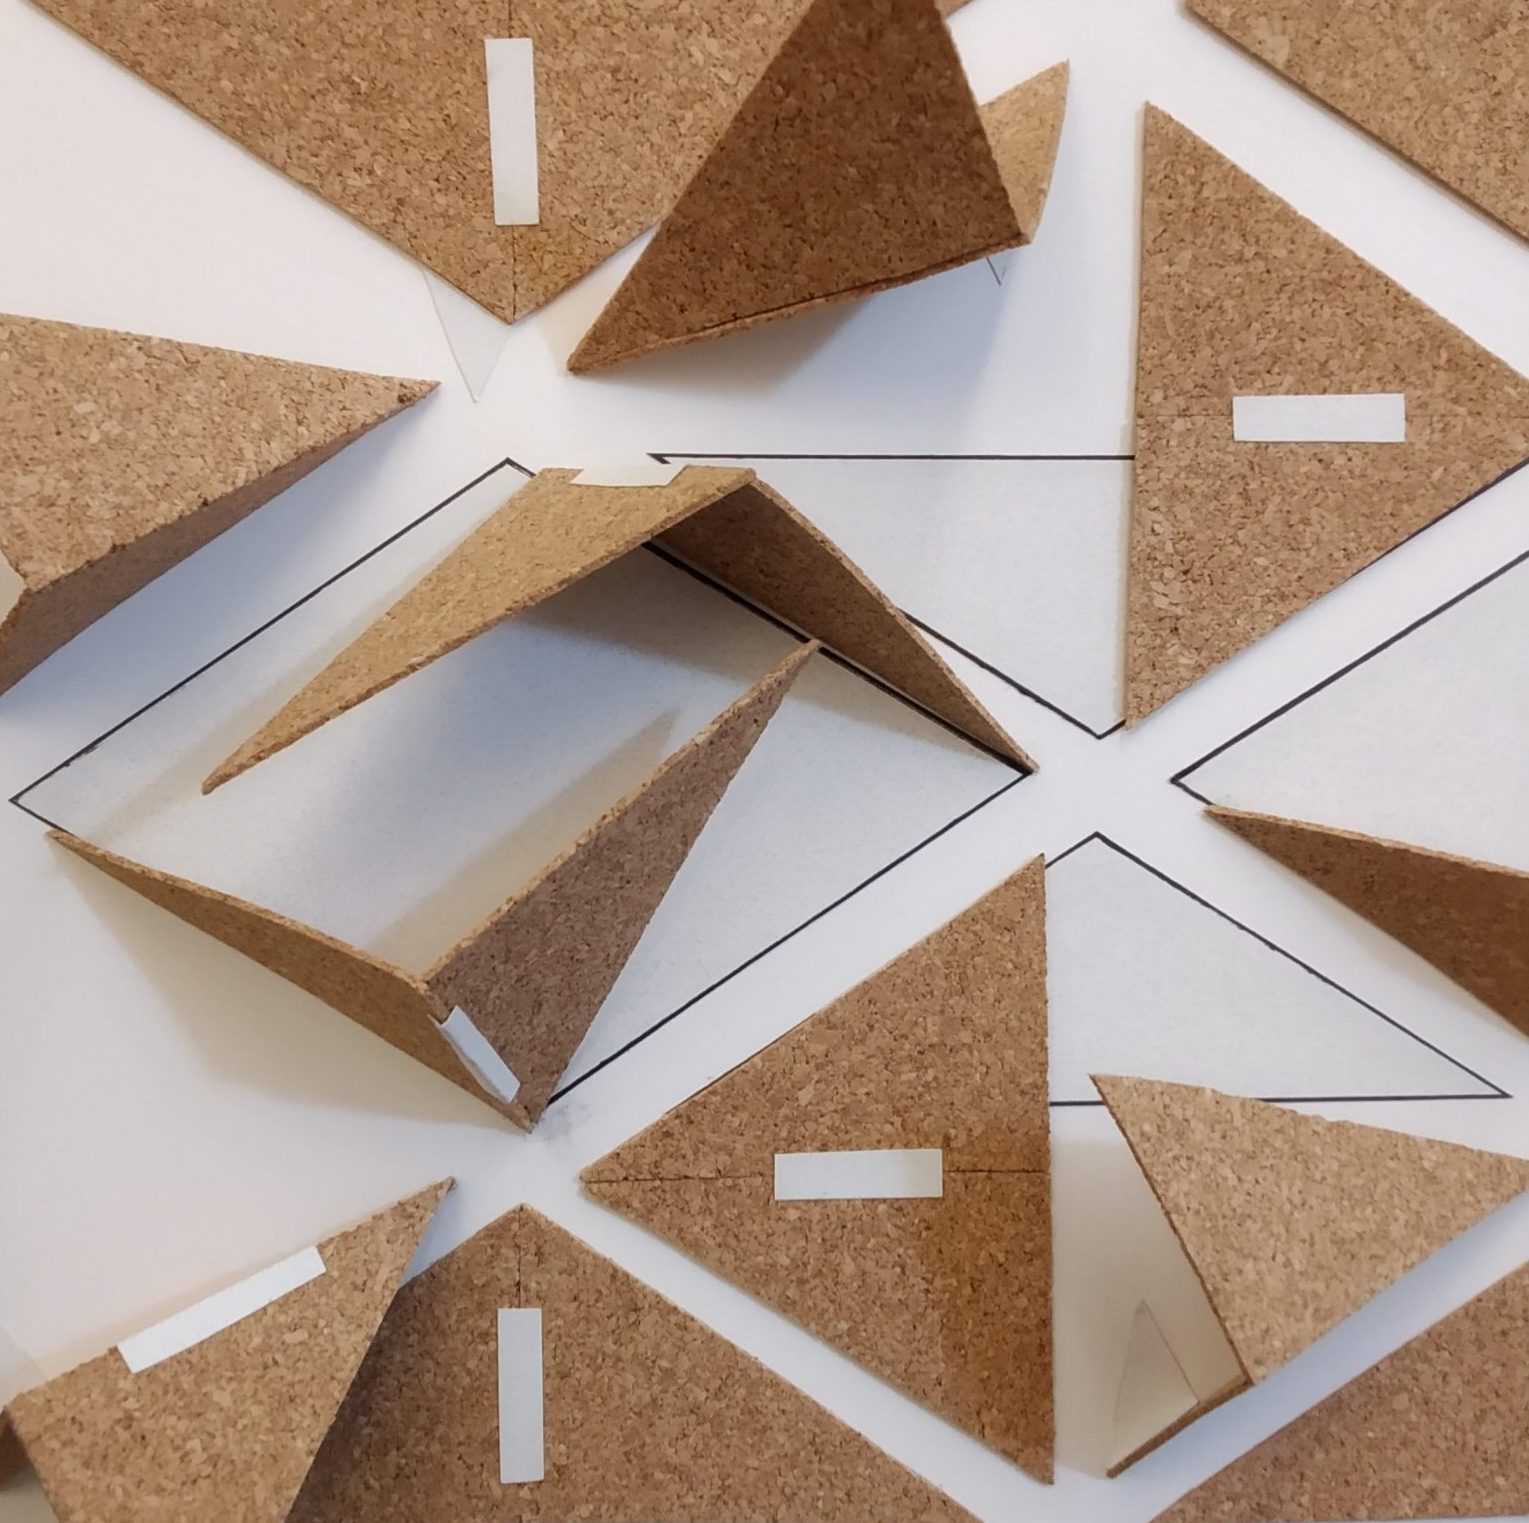 Model of cork triangles